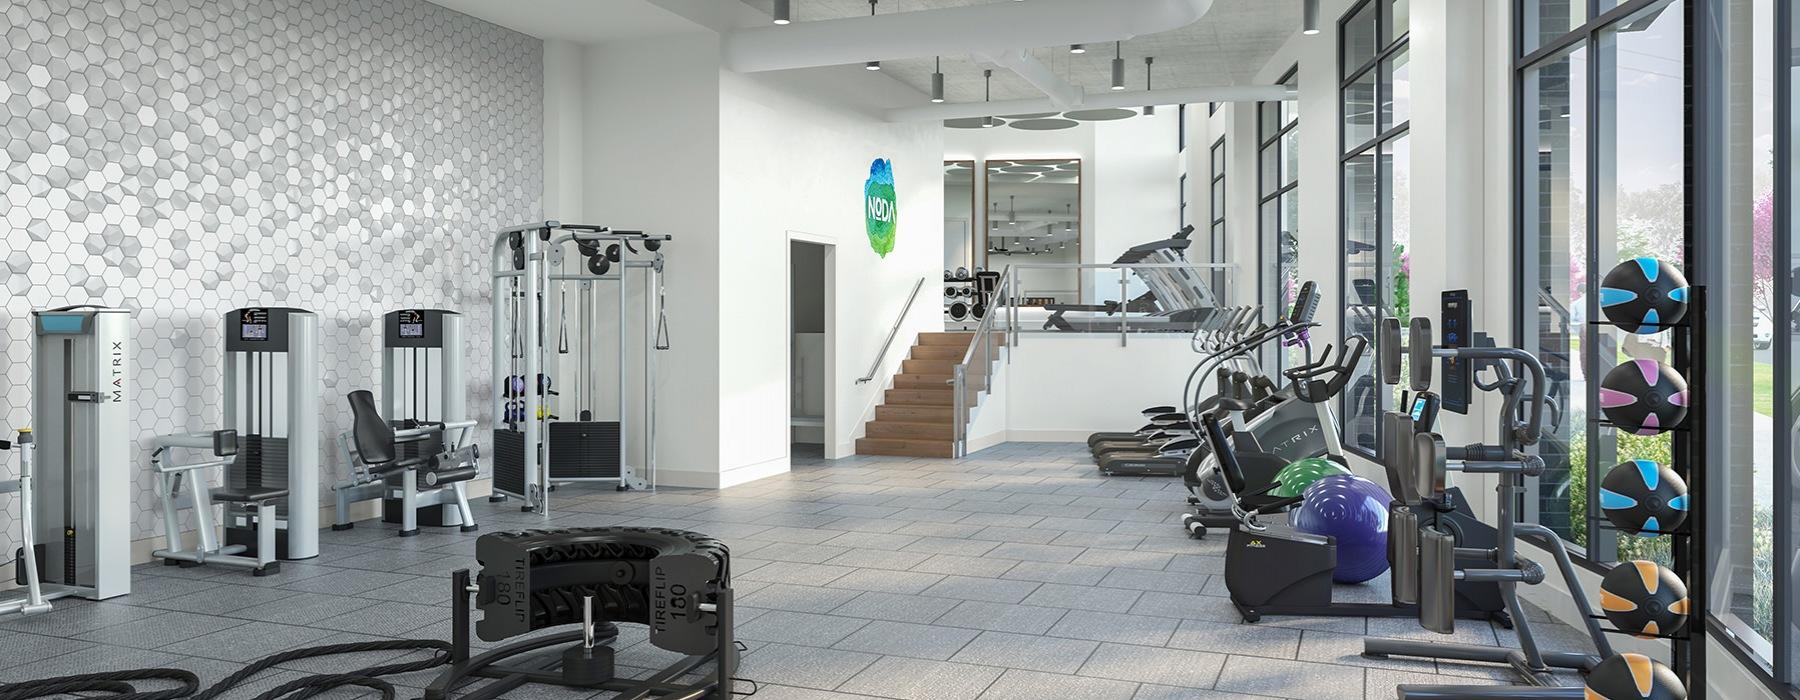 Fitness Center at Bainbridge NoDa